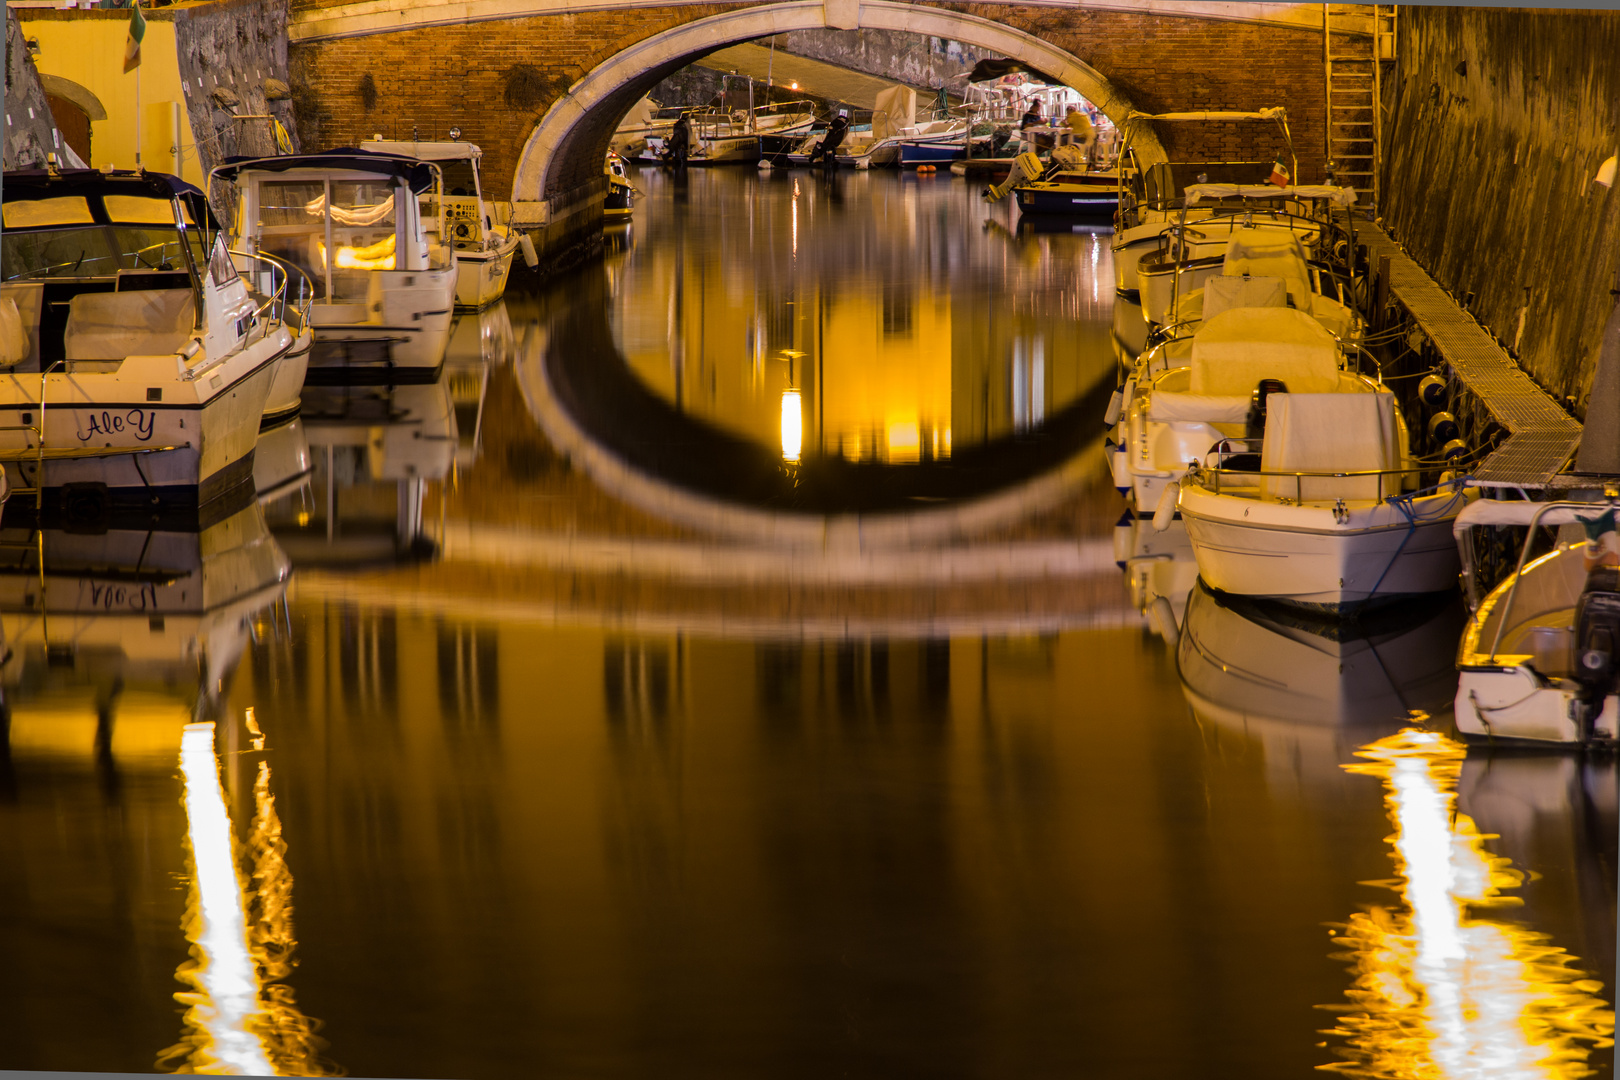 Livorno bei Nacht Nr. 2